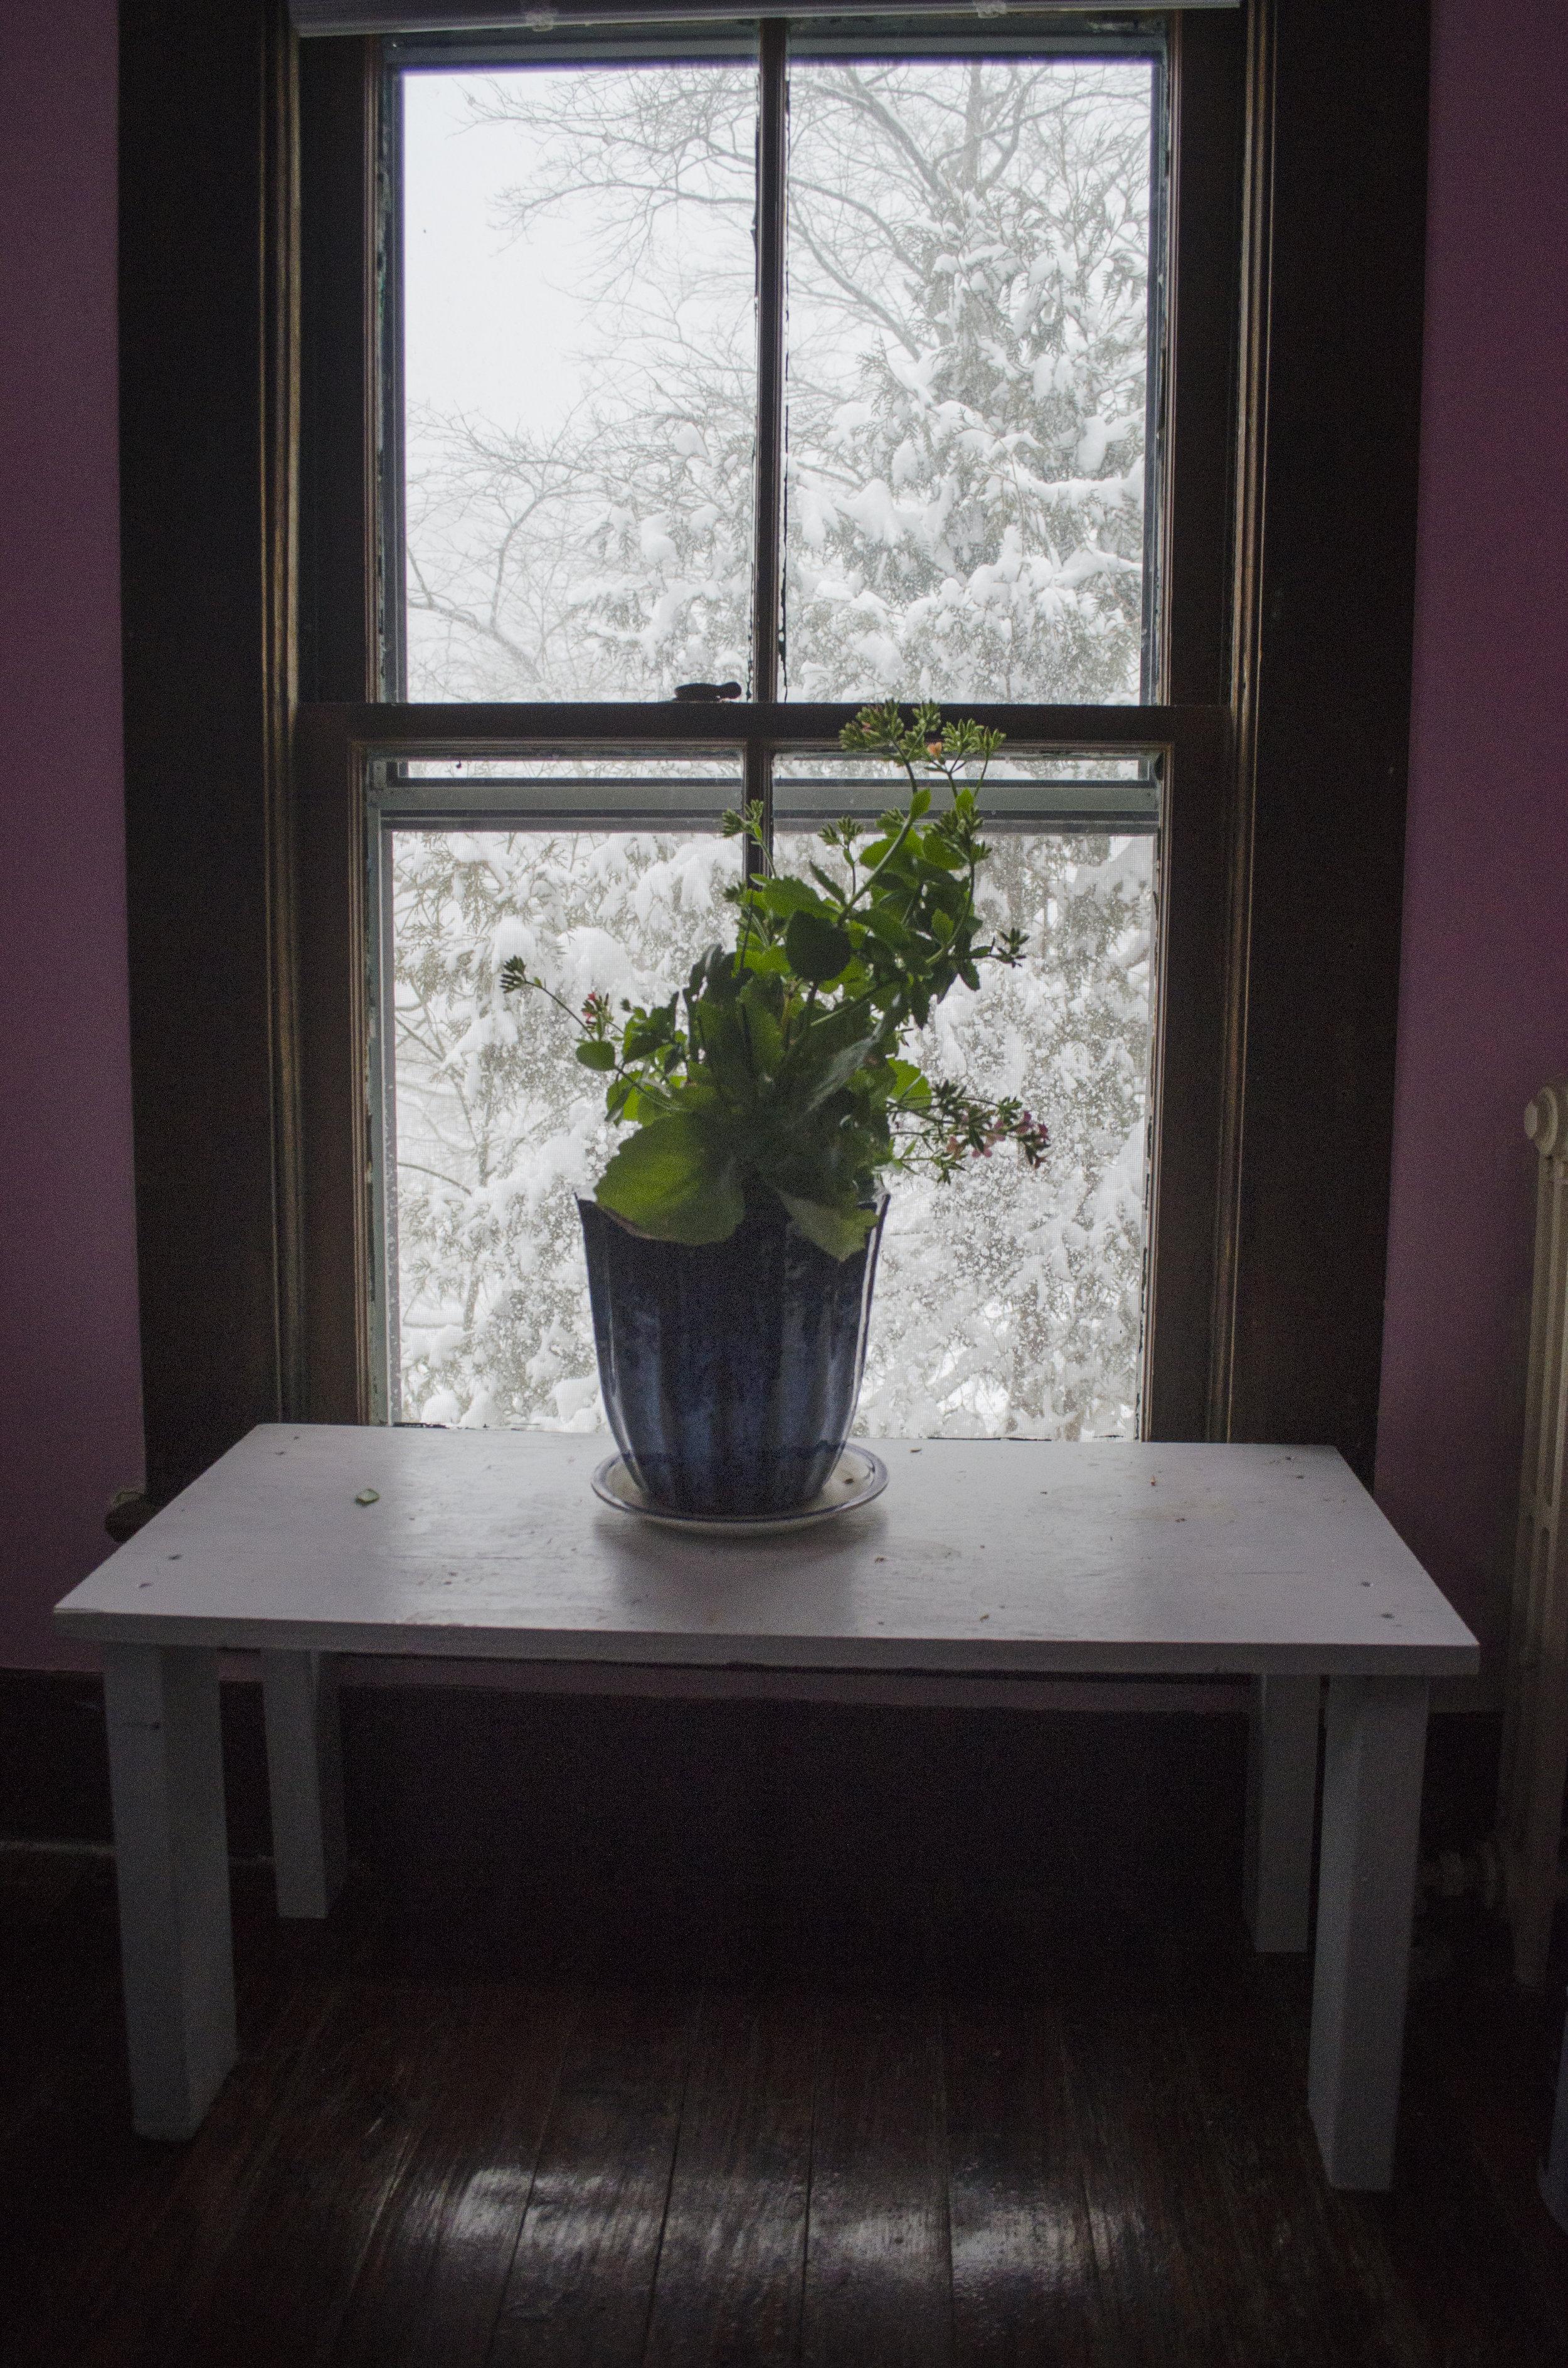 one-winter-day_32703089031_o.jpg